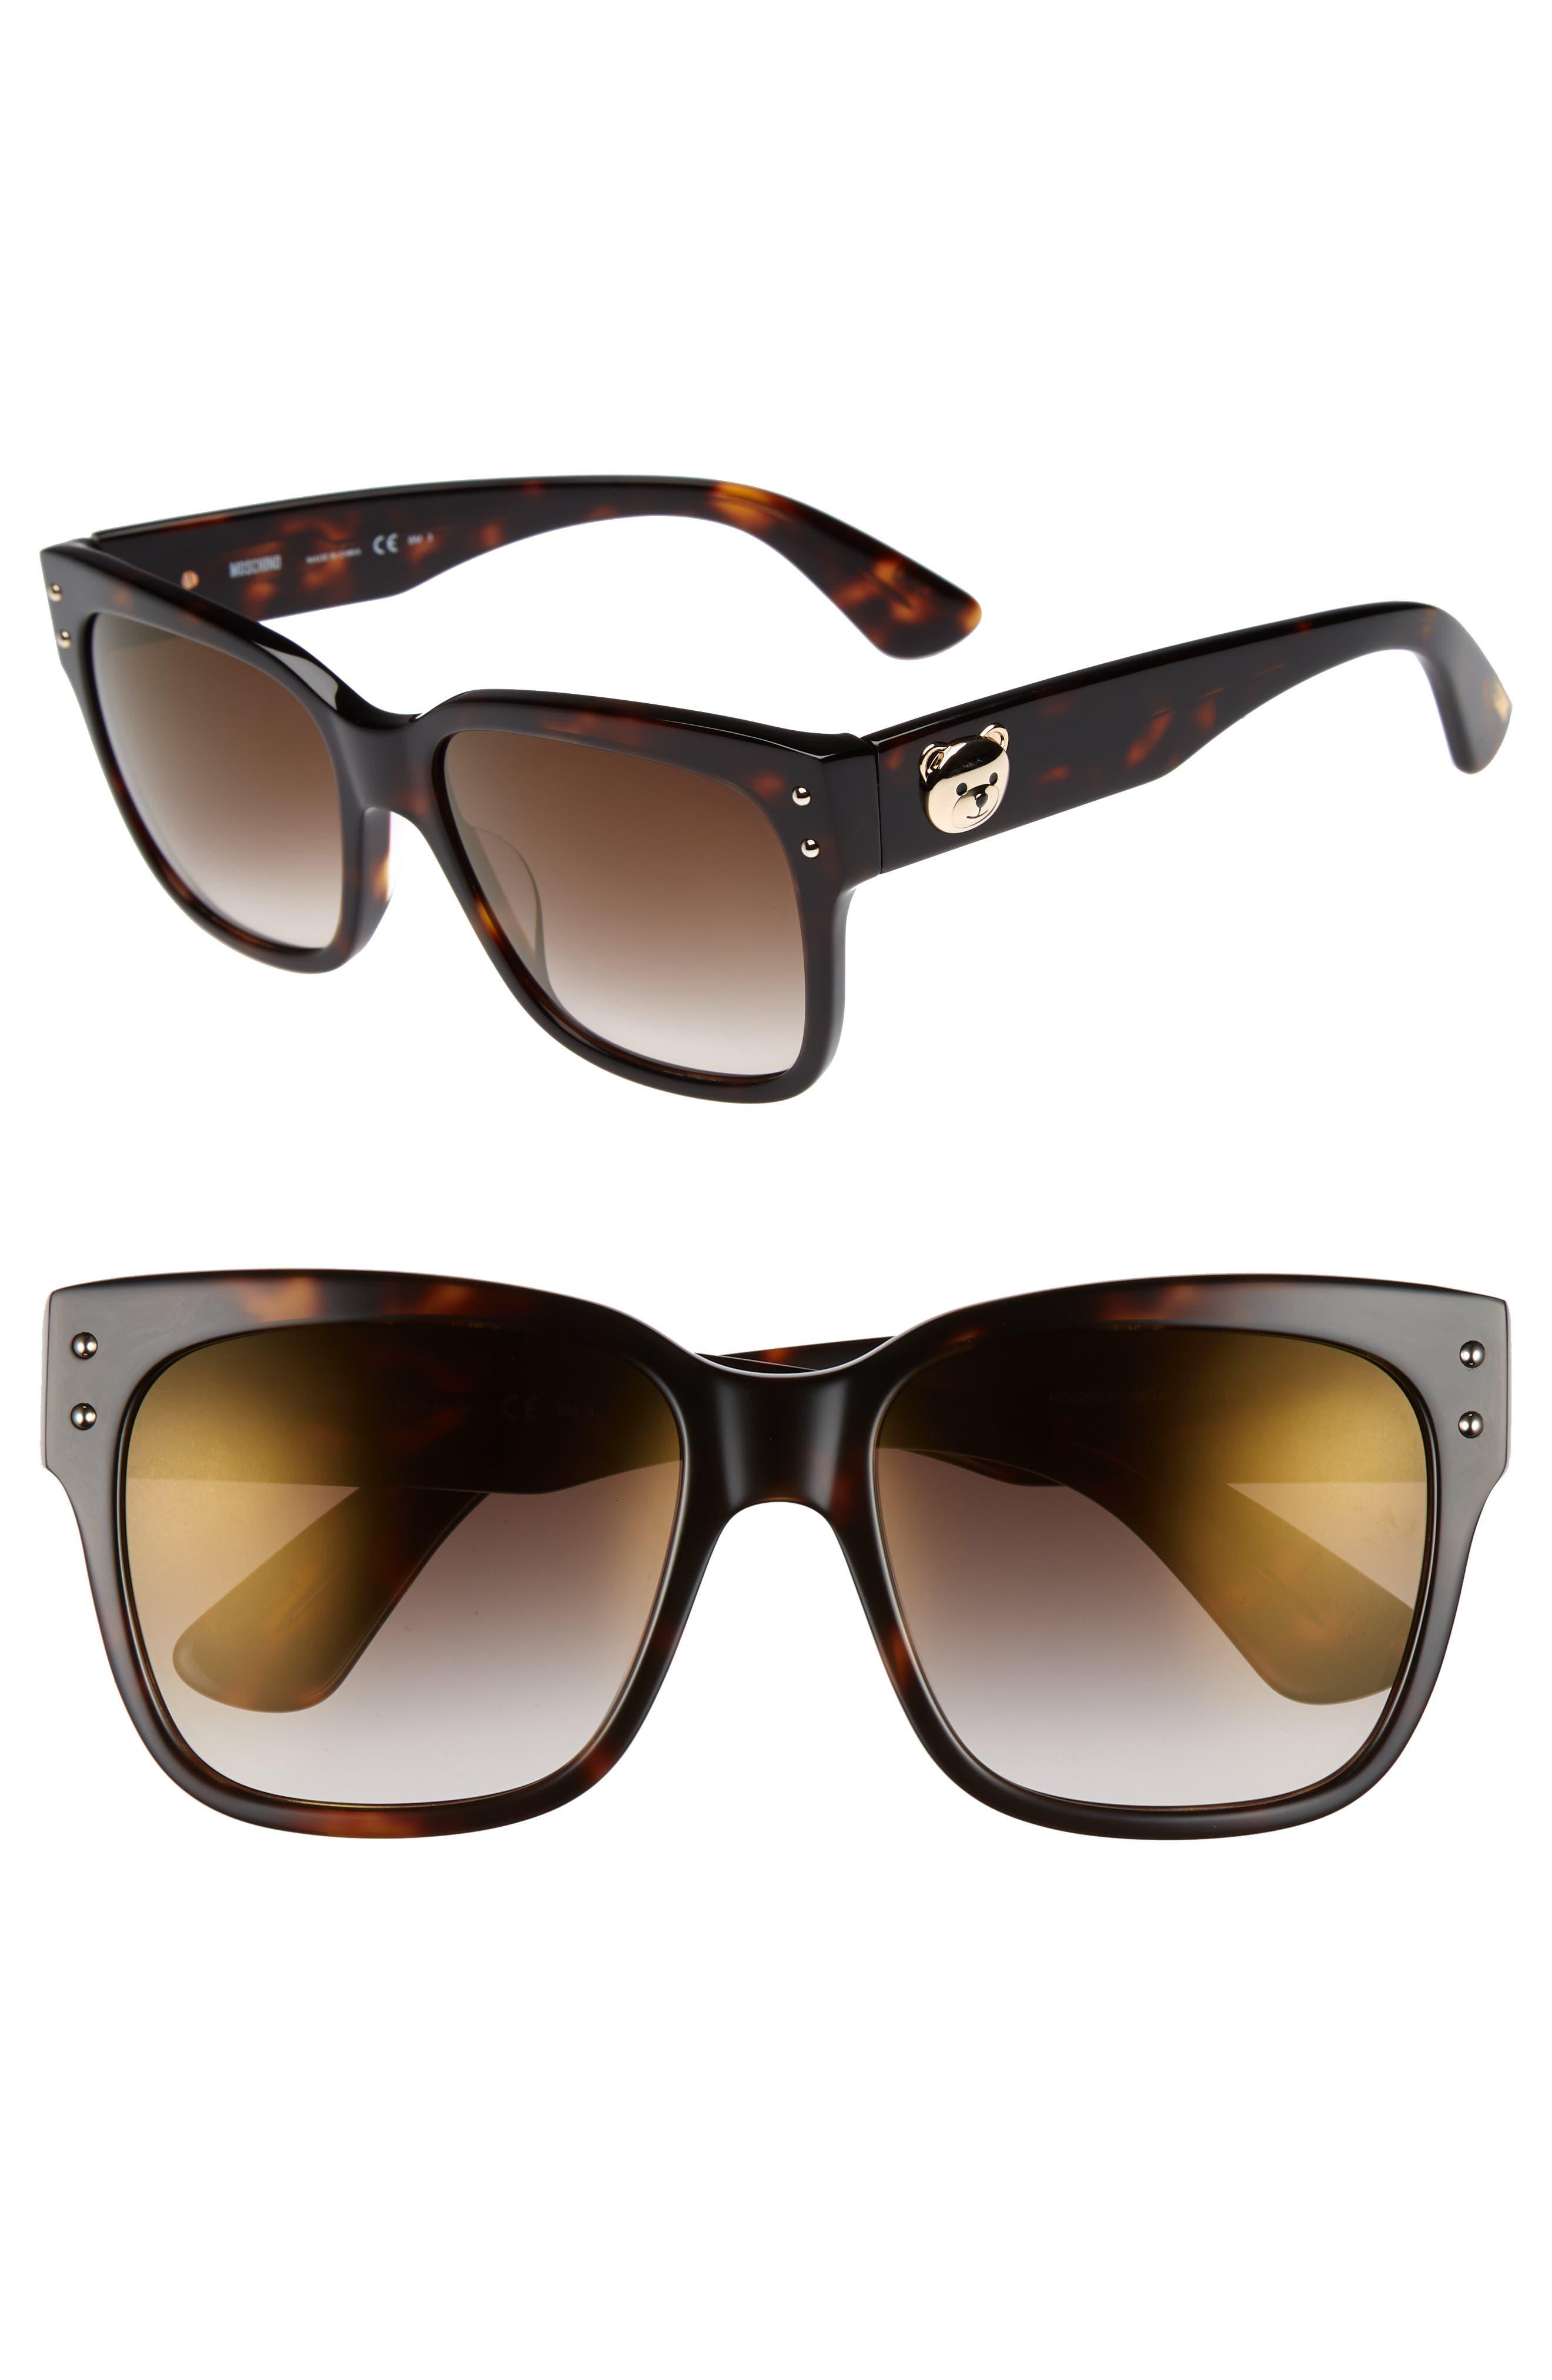 56mm Gradient Lens Sunglasses,                         Main,                         color, Dark Havana